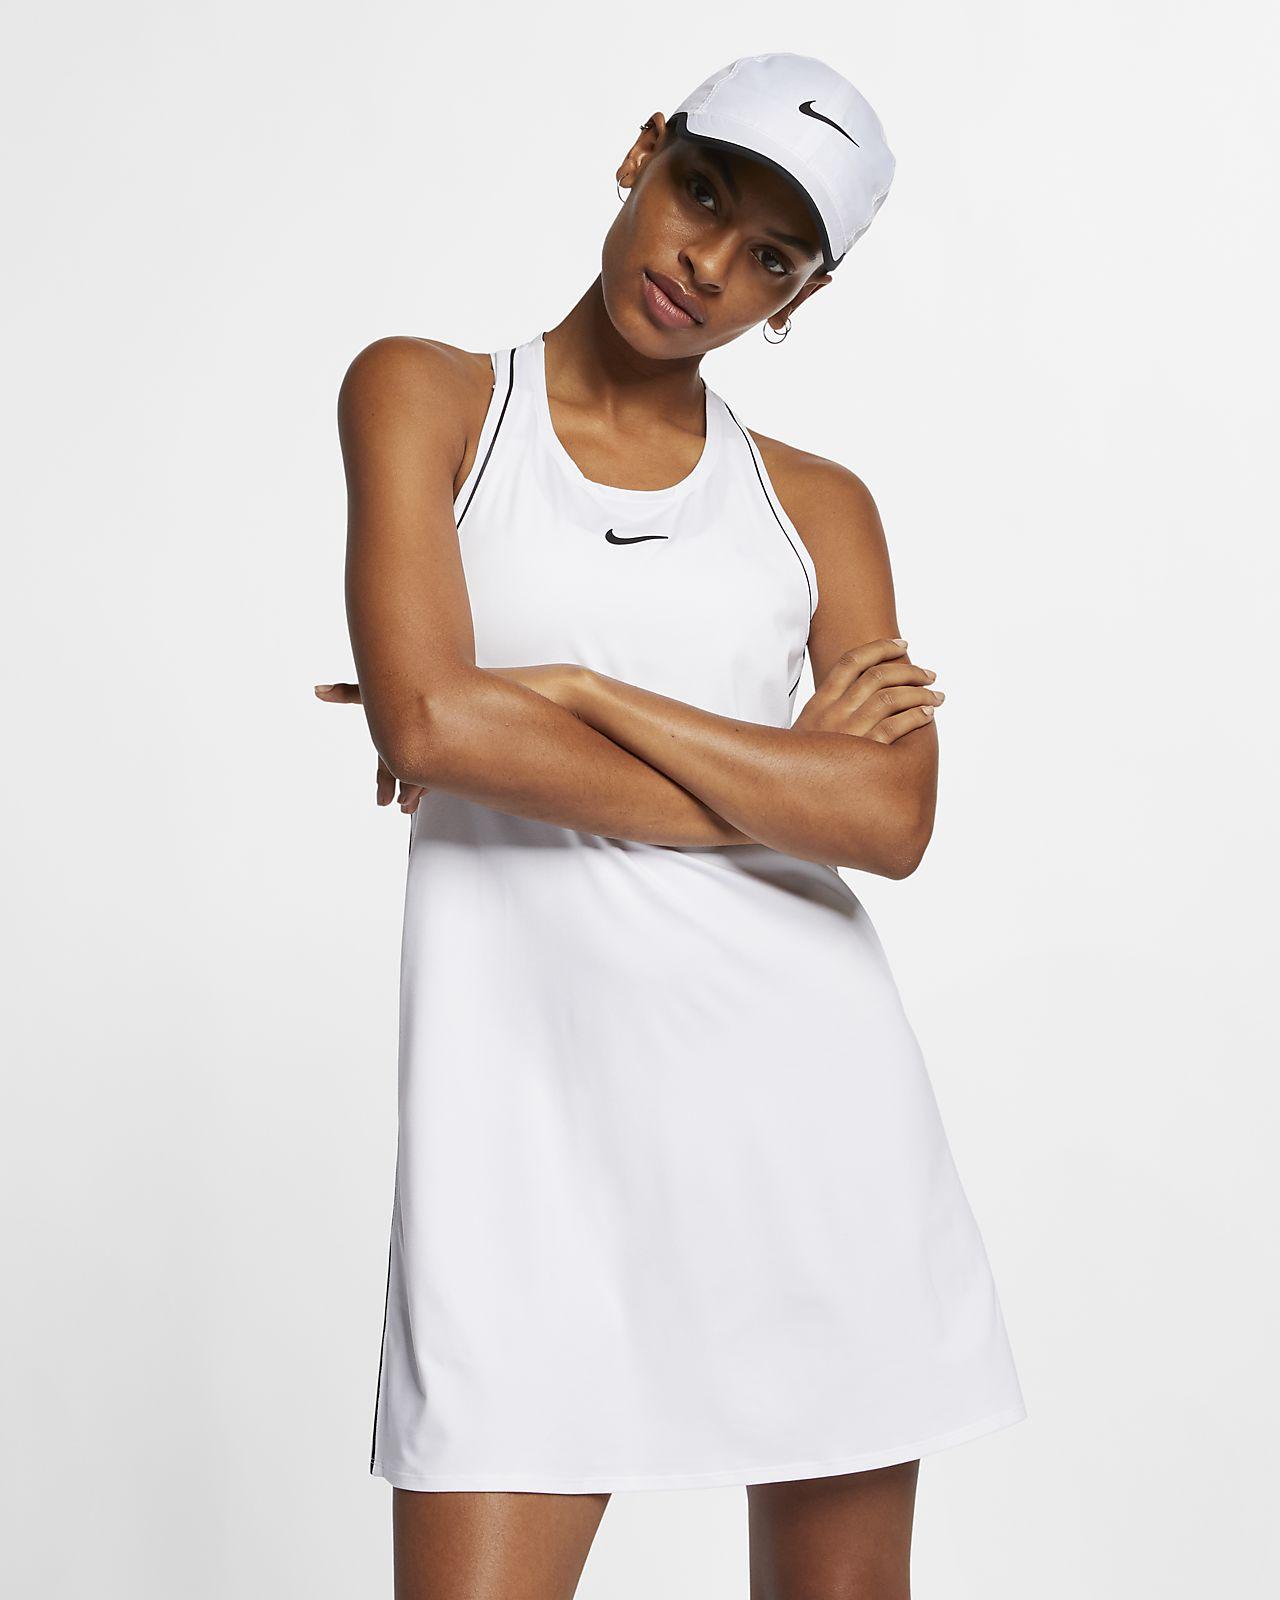 Vestido Dri Para Pr Tenis De Mujer Fit Nikecourt p8Rfqp